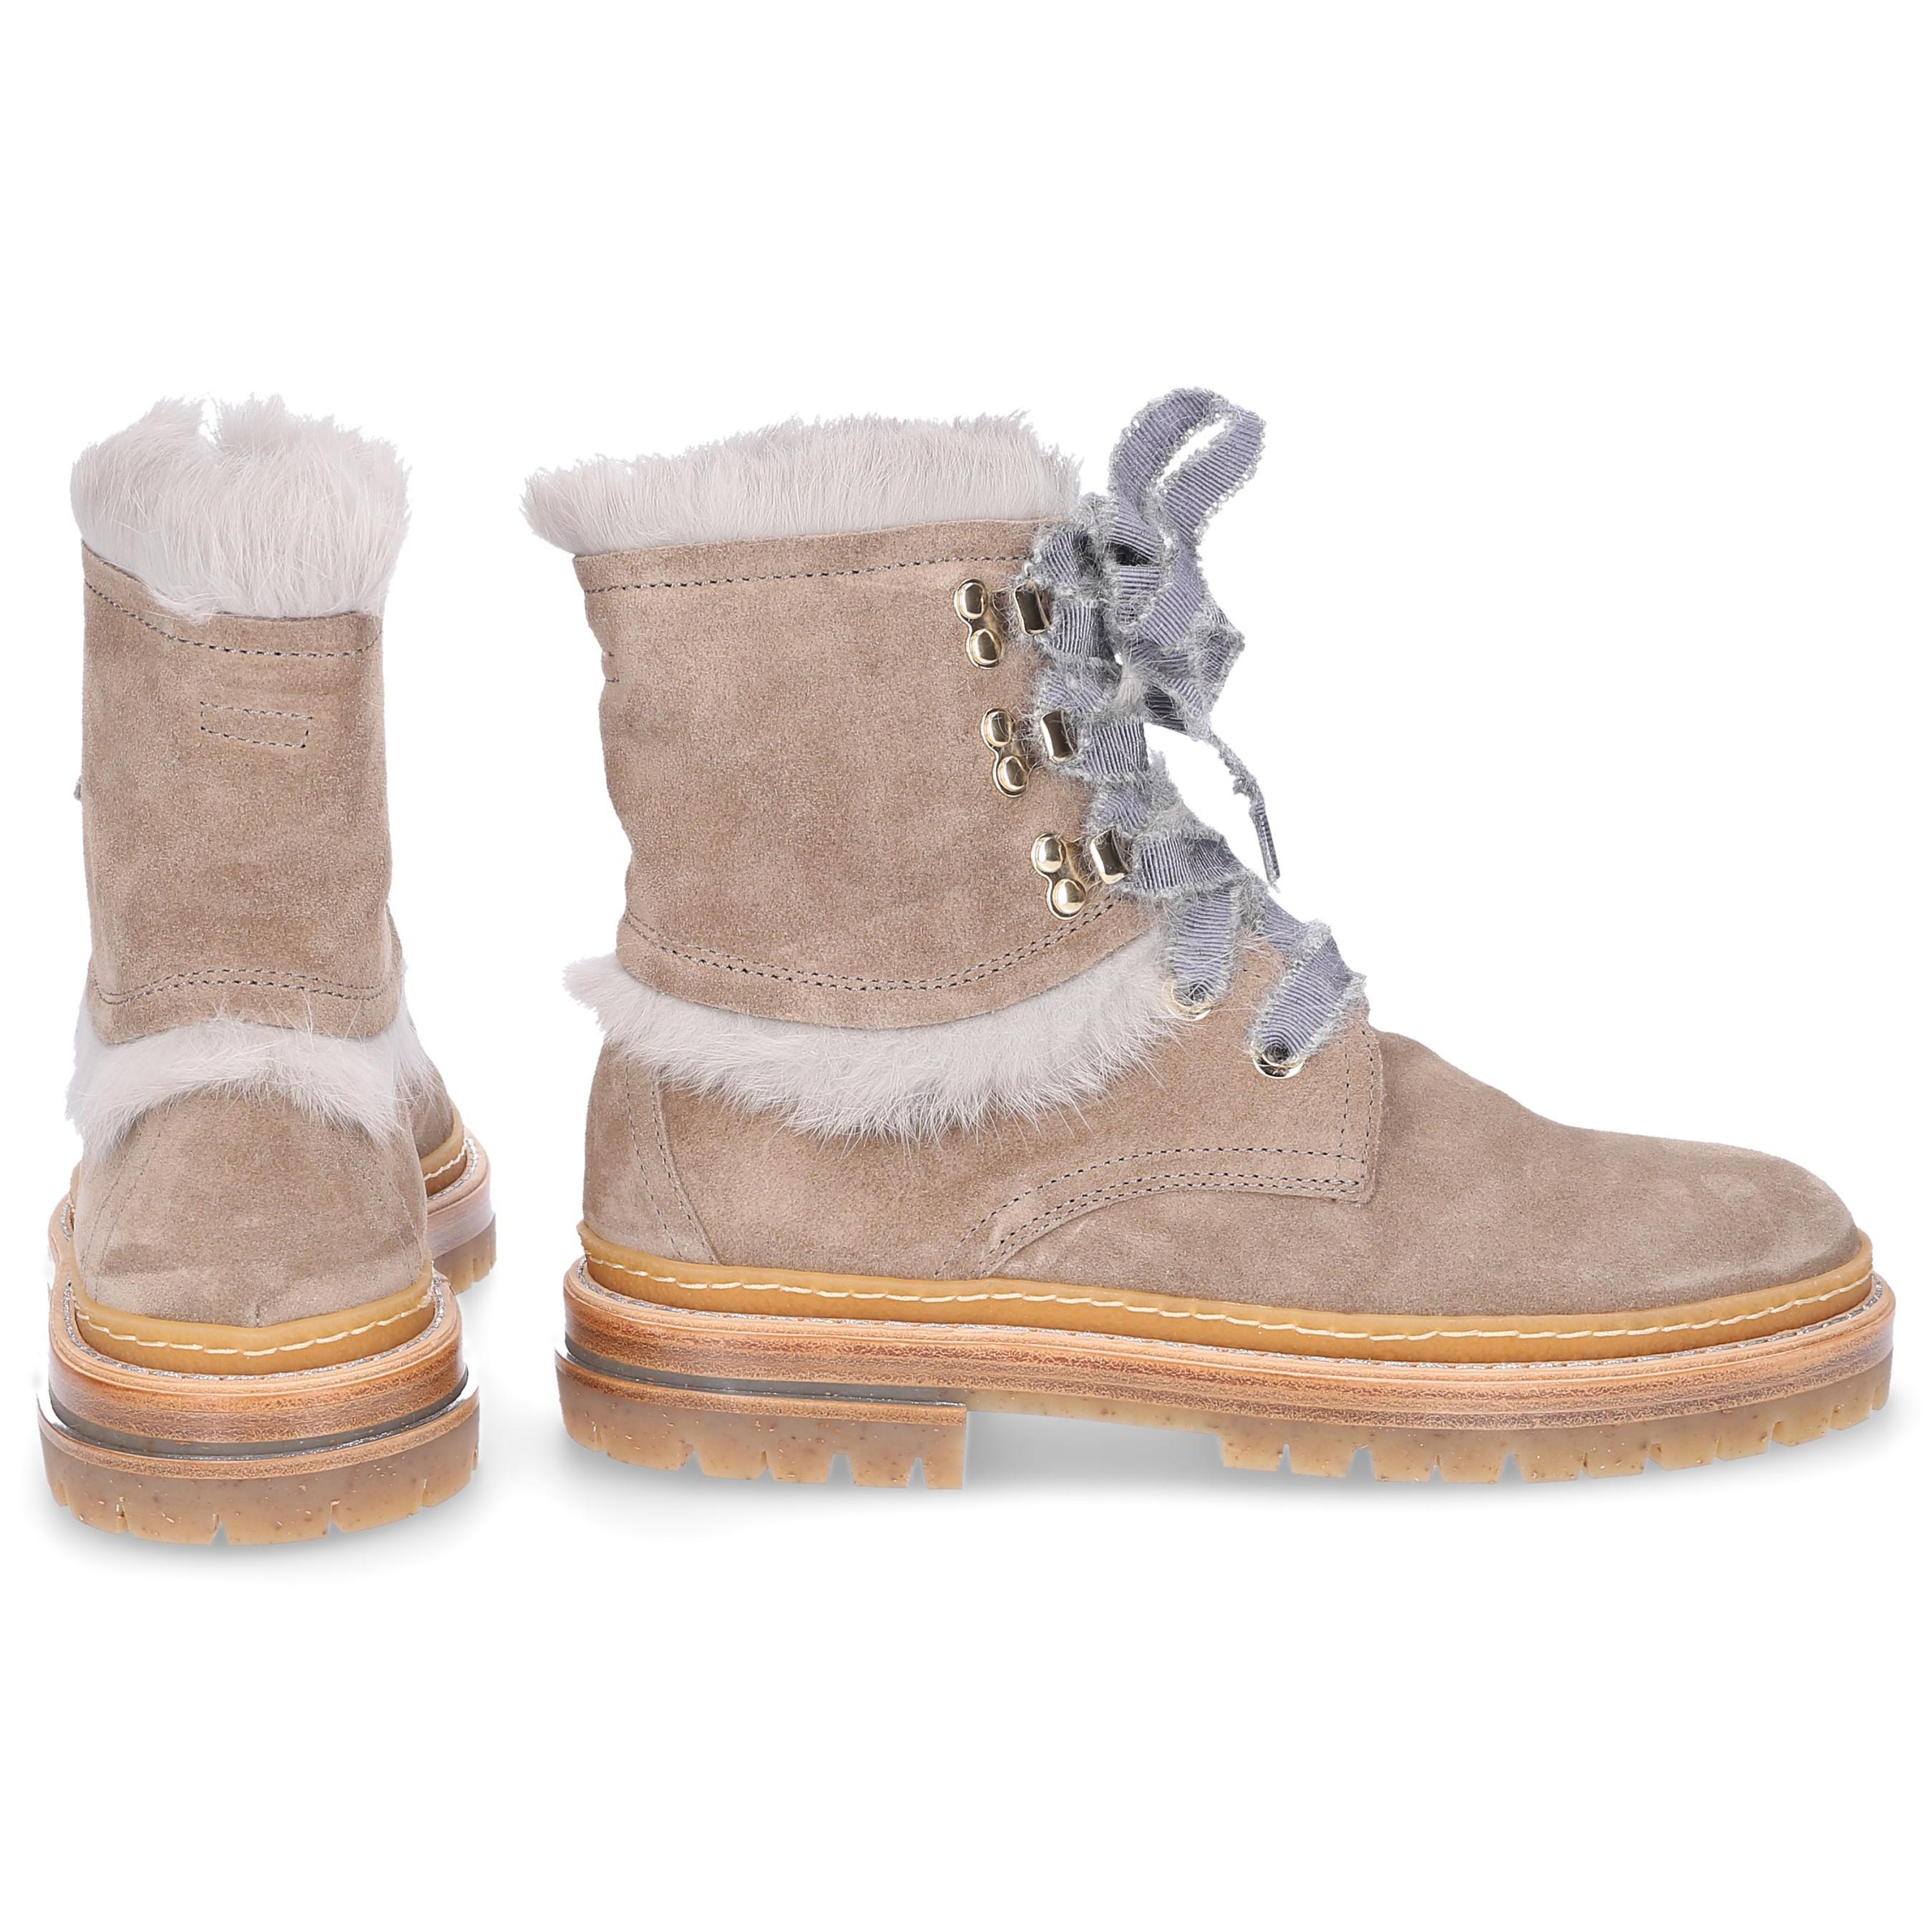 da1d6aedec5 Lyst - Agl Attilio Giusti Leombruni Ankle Boots D717576 Rabbit Fur ...